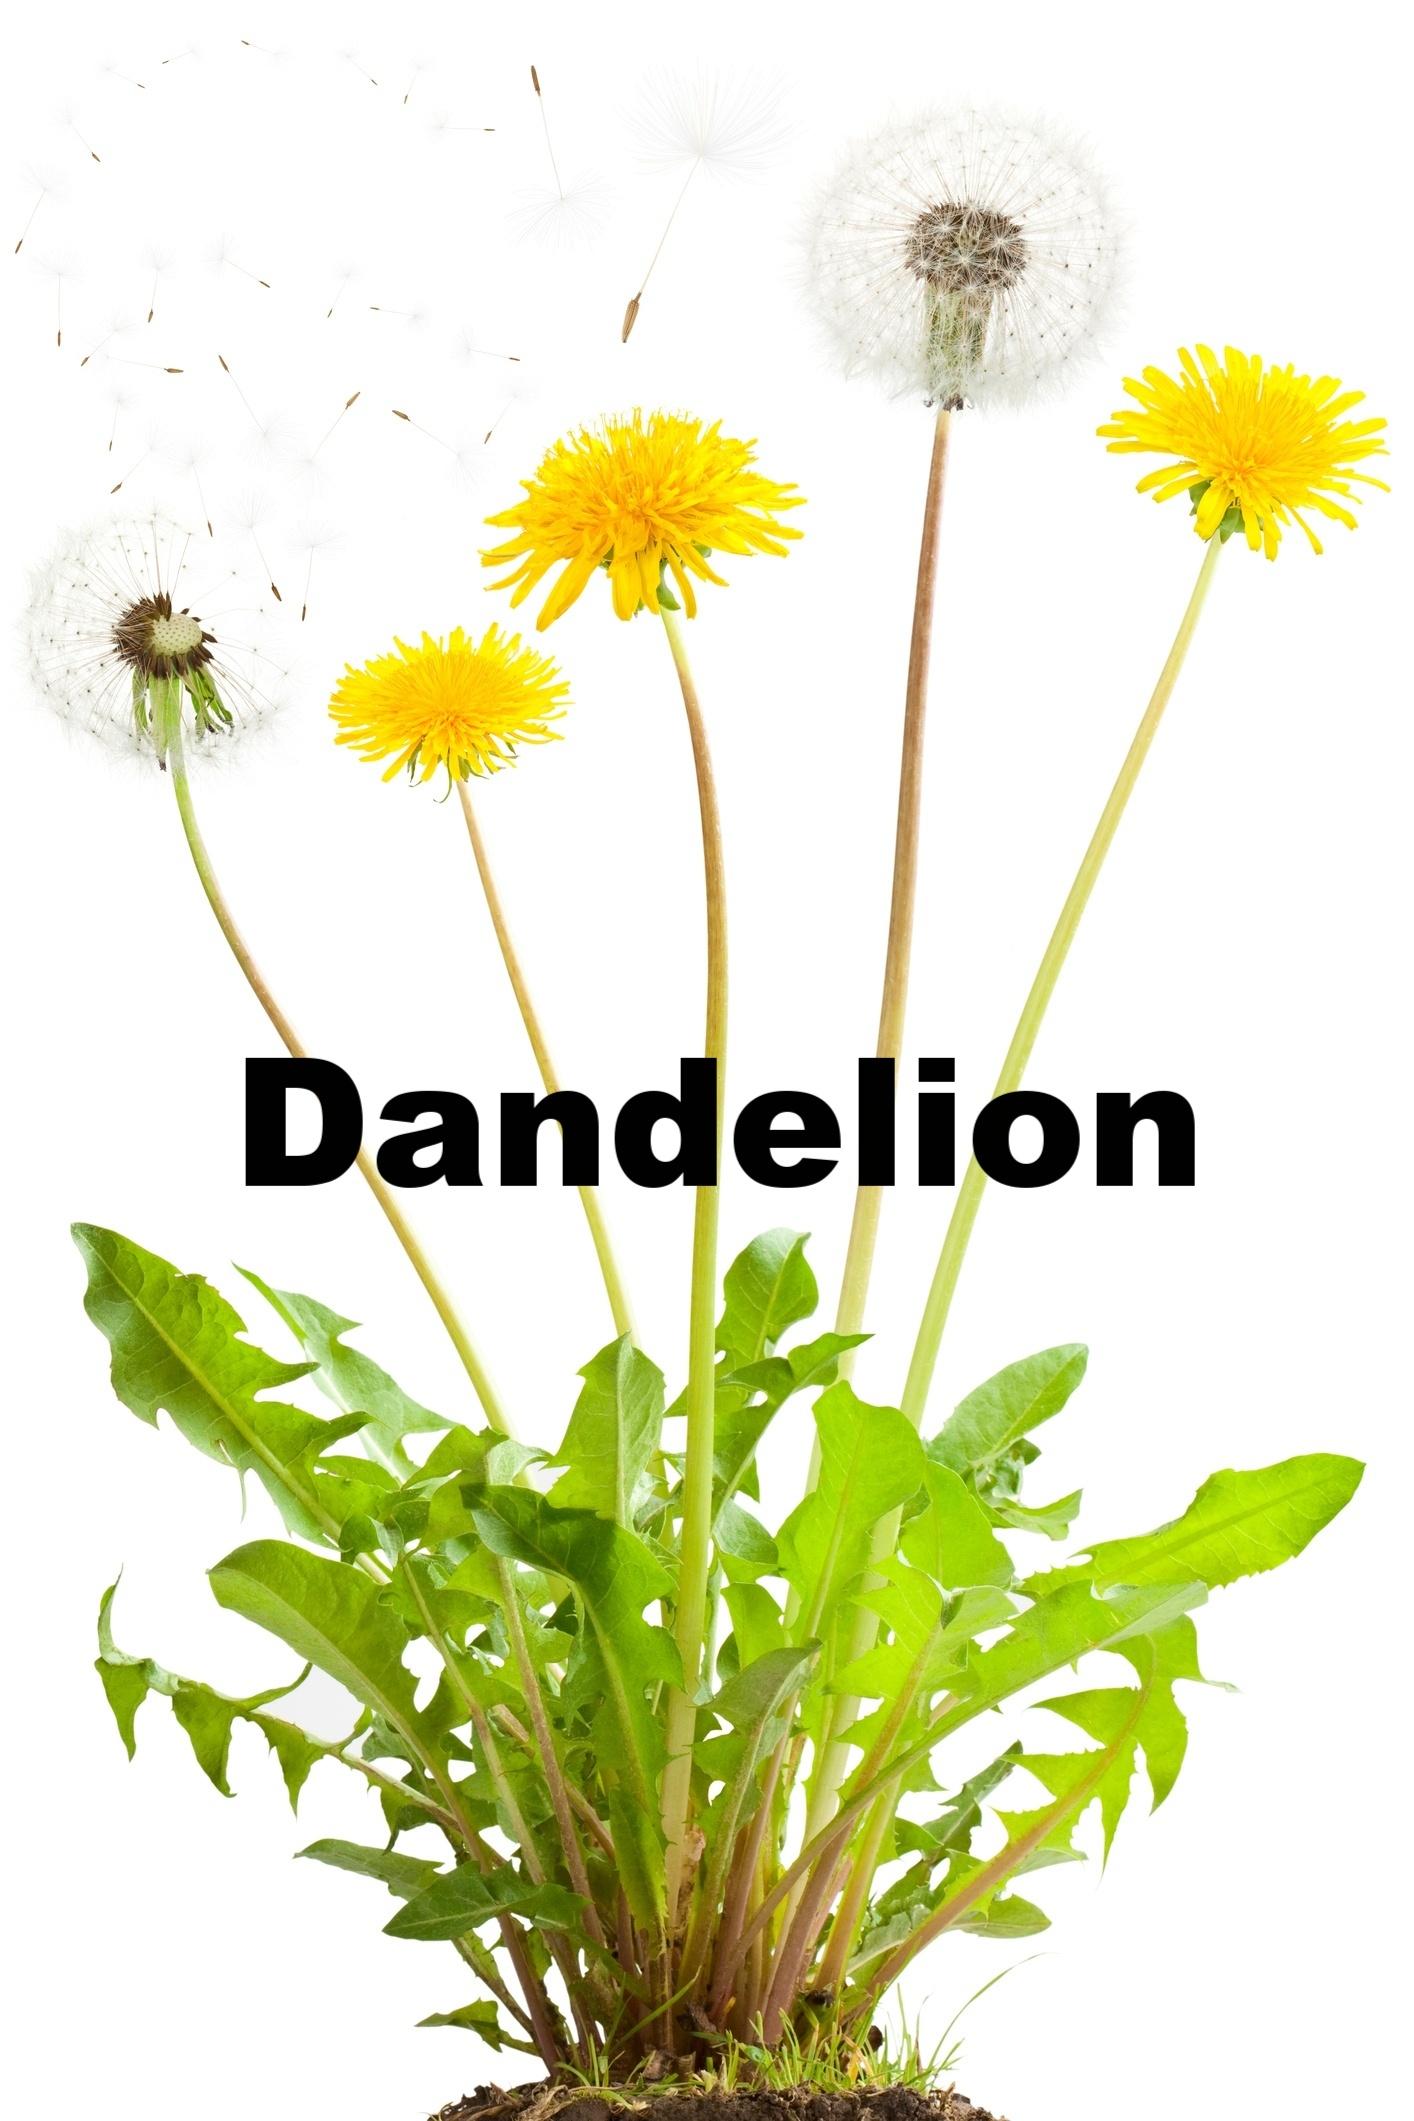 Dandelion-Identification-288401-edited.jpg